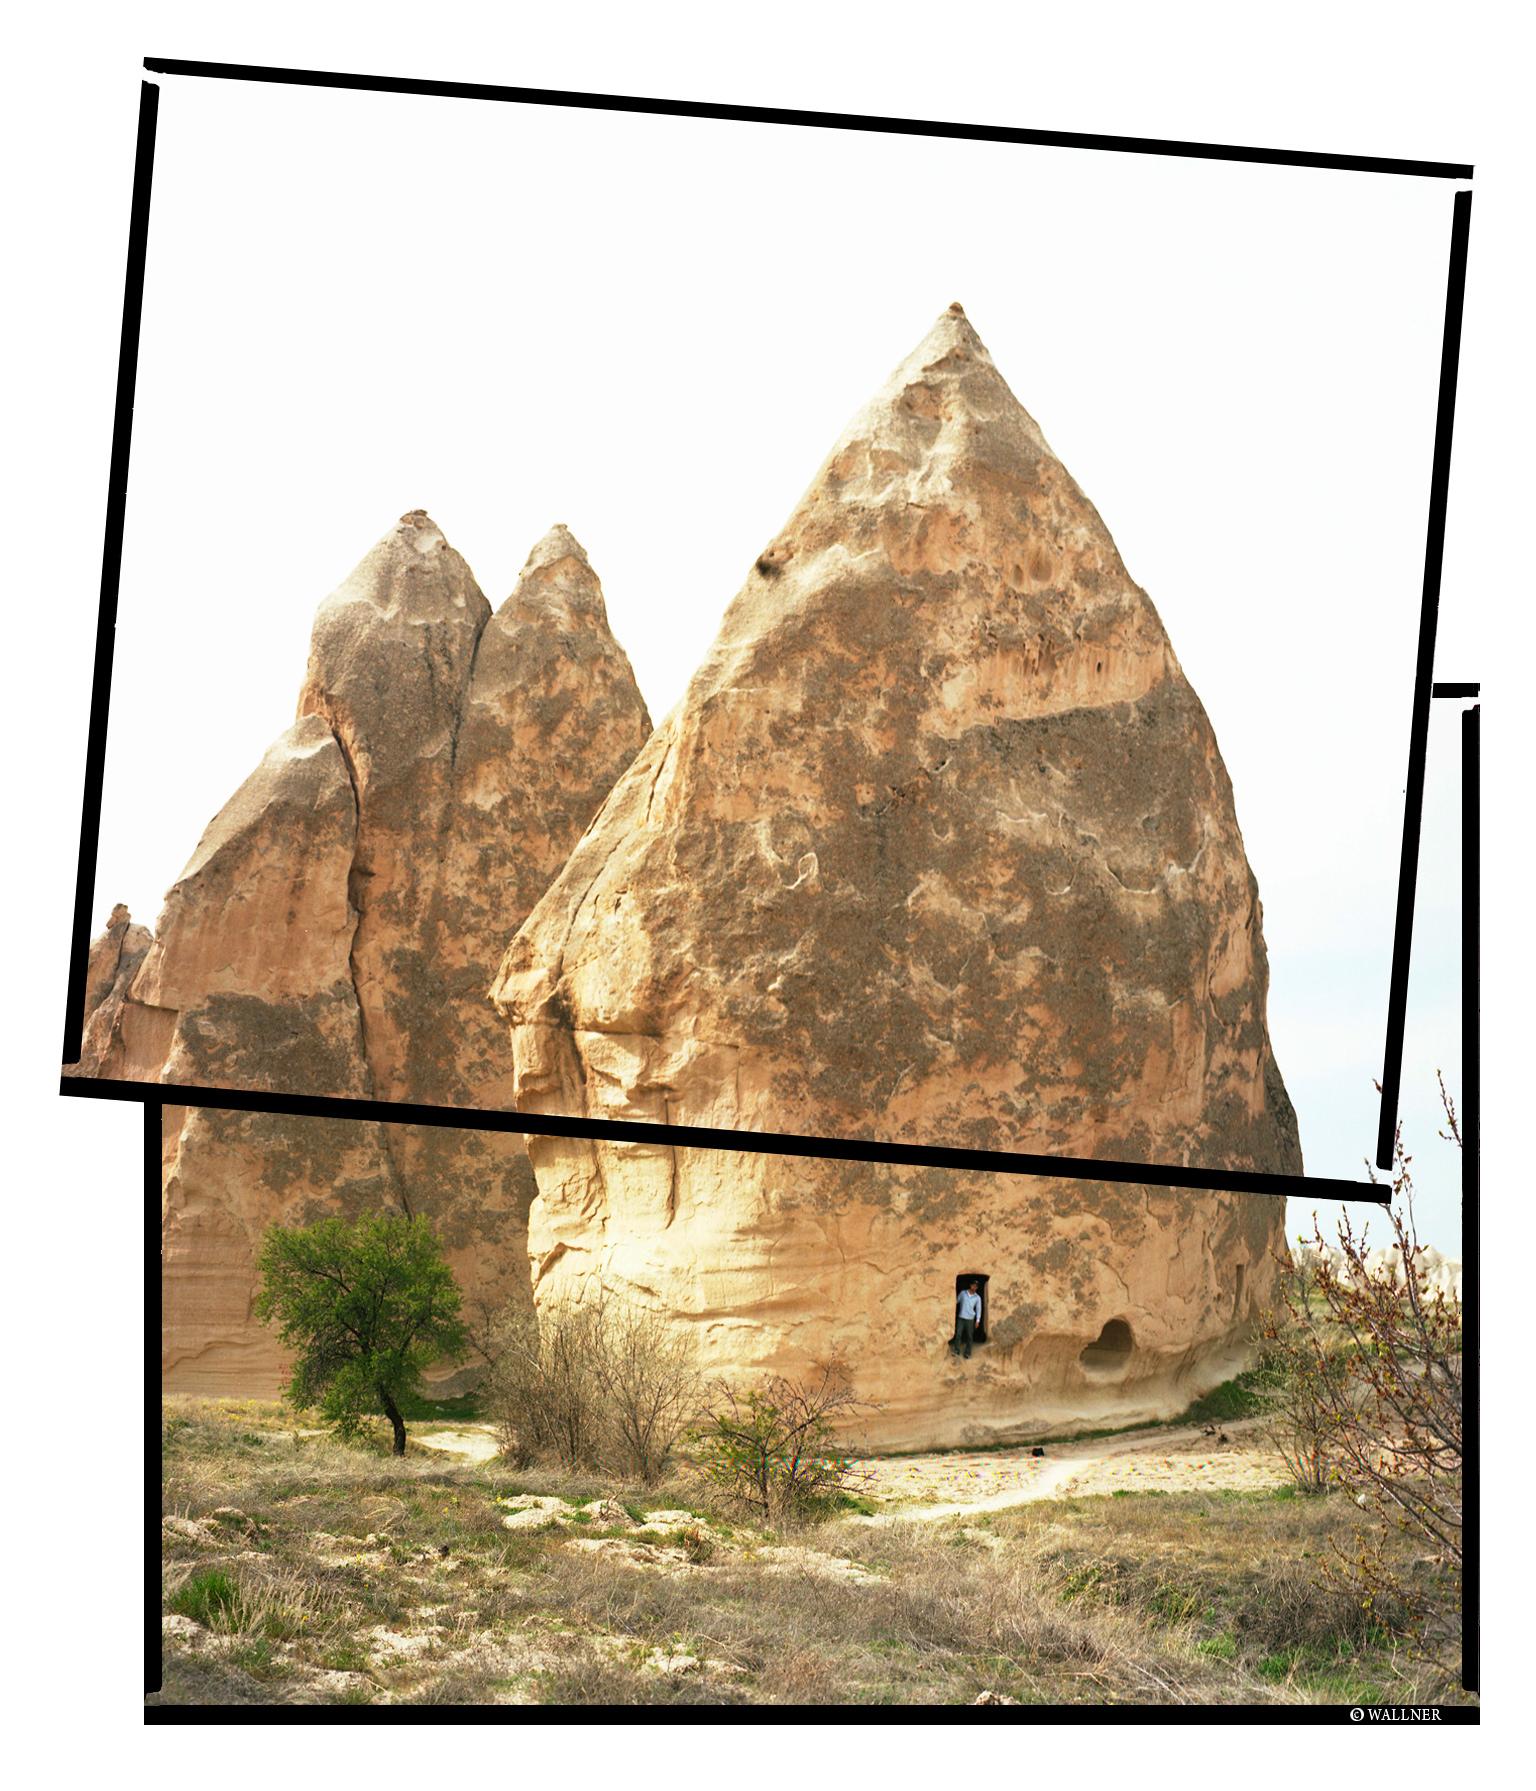 MediumFormatPatrikWallner_Cappadocia_KennyInRockLOWQ